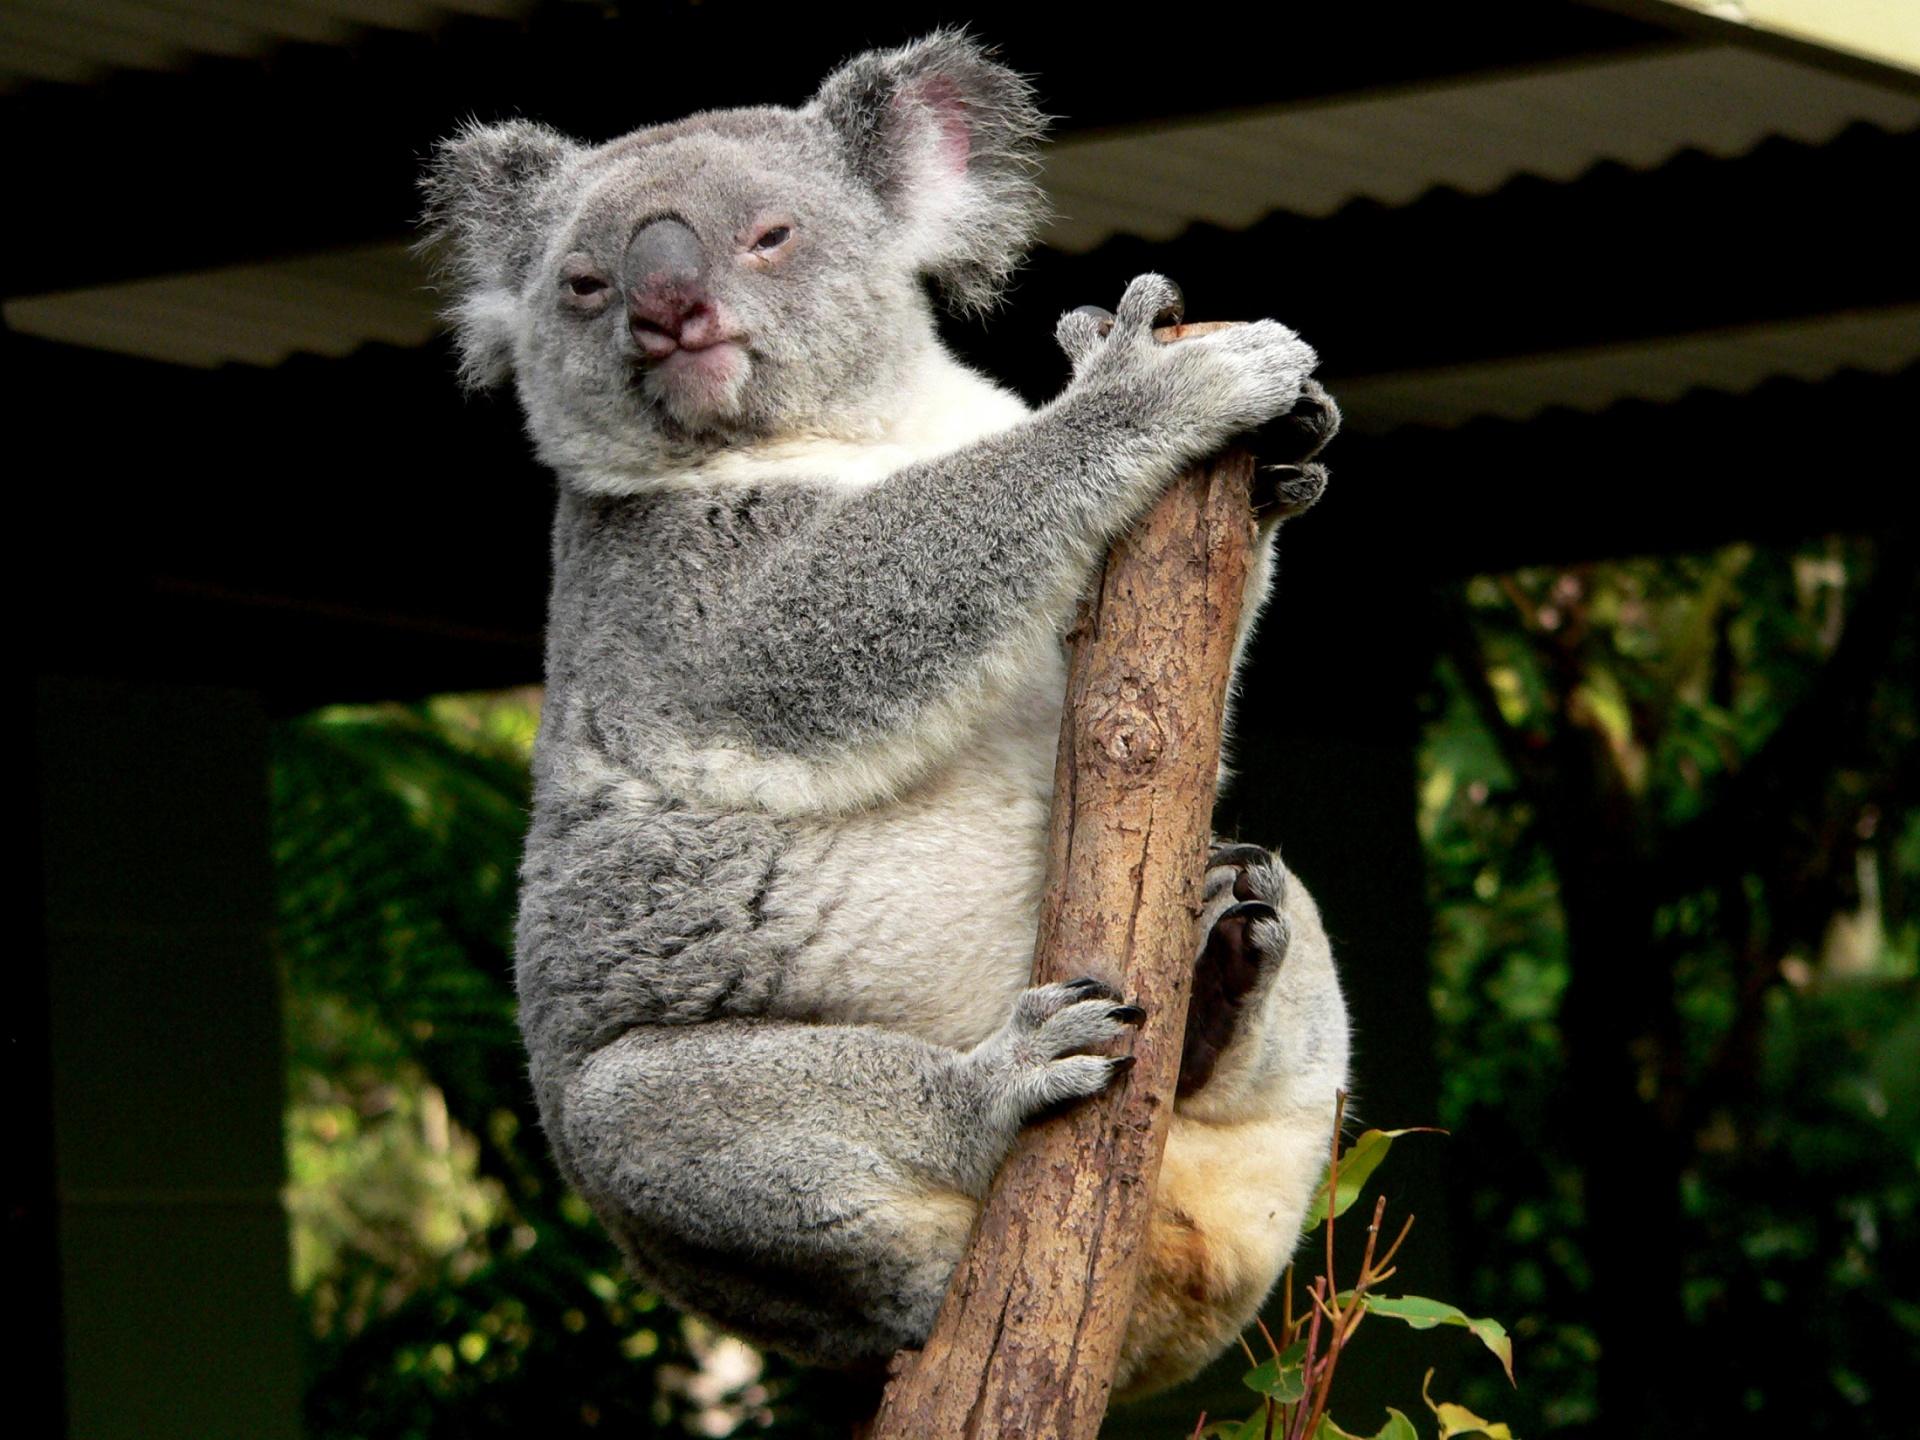 Cute Koala Wallpaper Koala Bear Free Stock Photo Public Domain Pictures